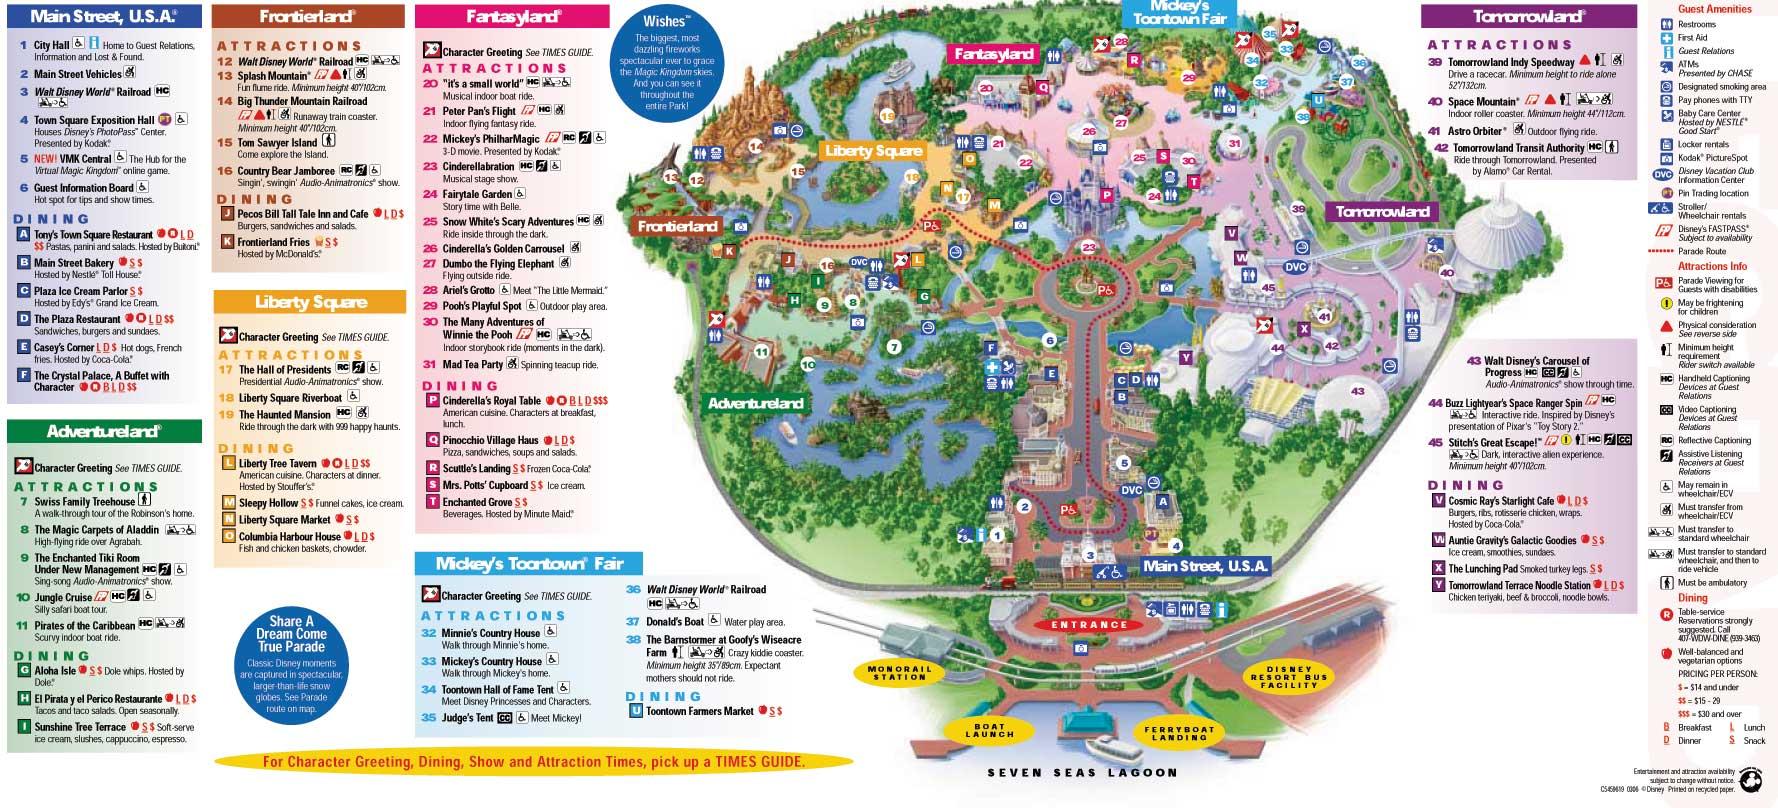 Magic Kingdom Adventureland Map 2013 Photos | Good Pix Gallery